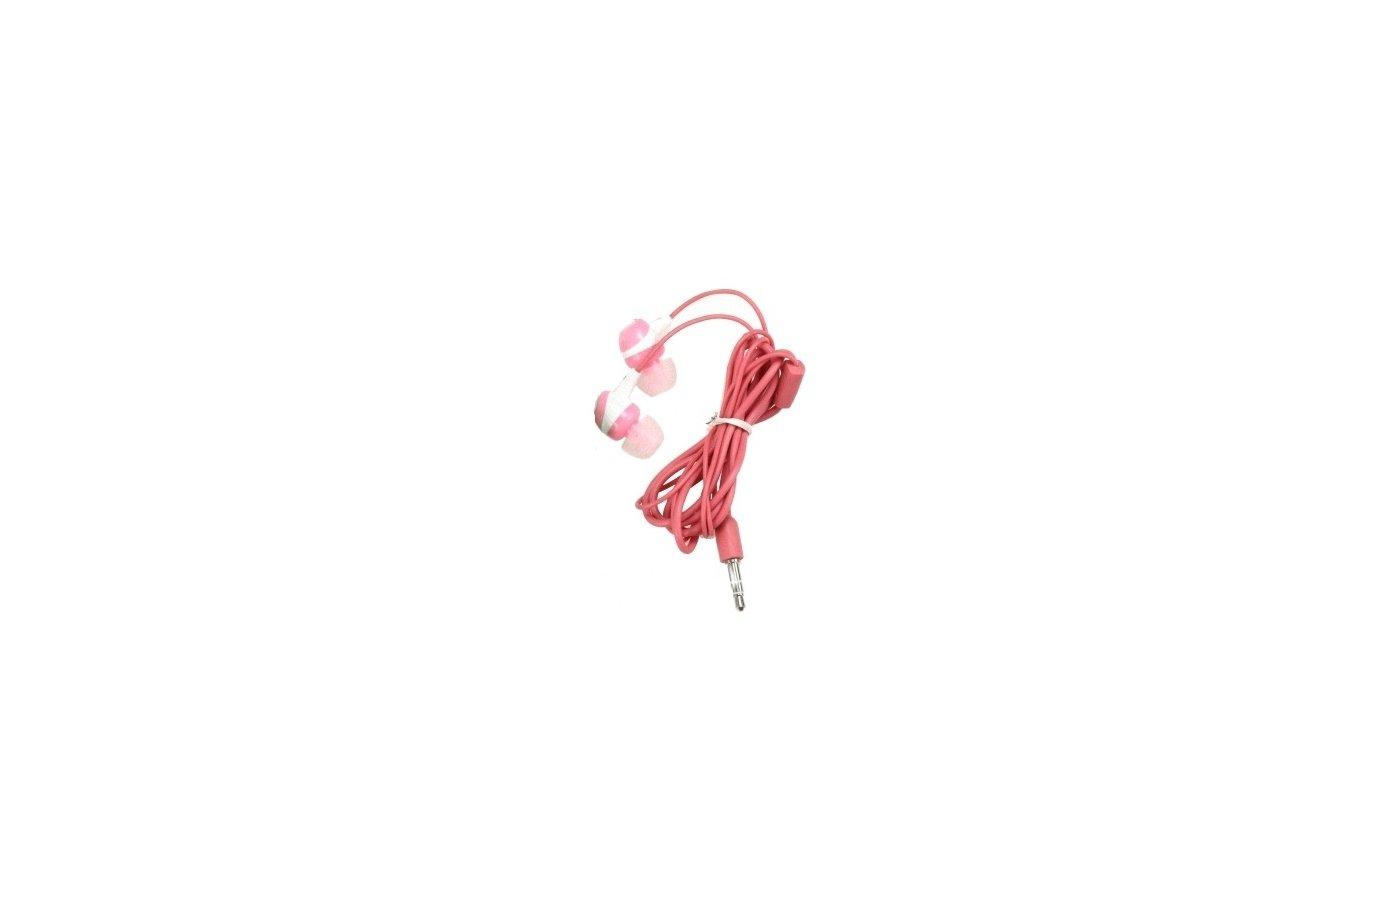 Наушники вкладыши Fischer Audio Sempai SPE-21 розовый